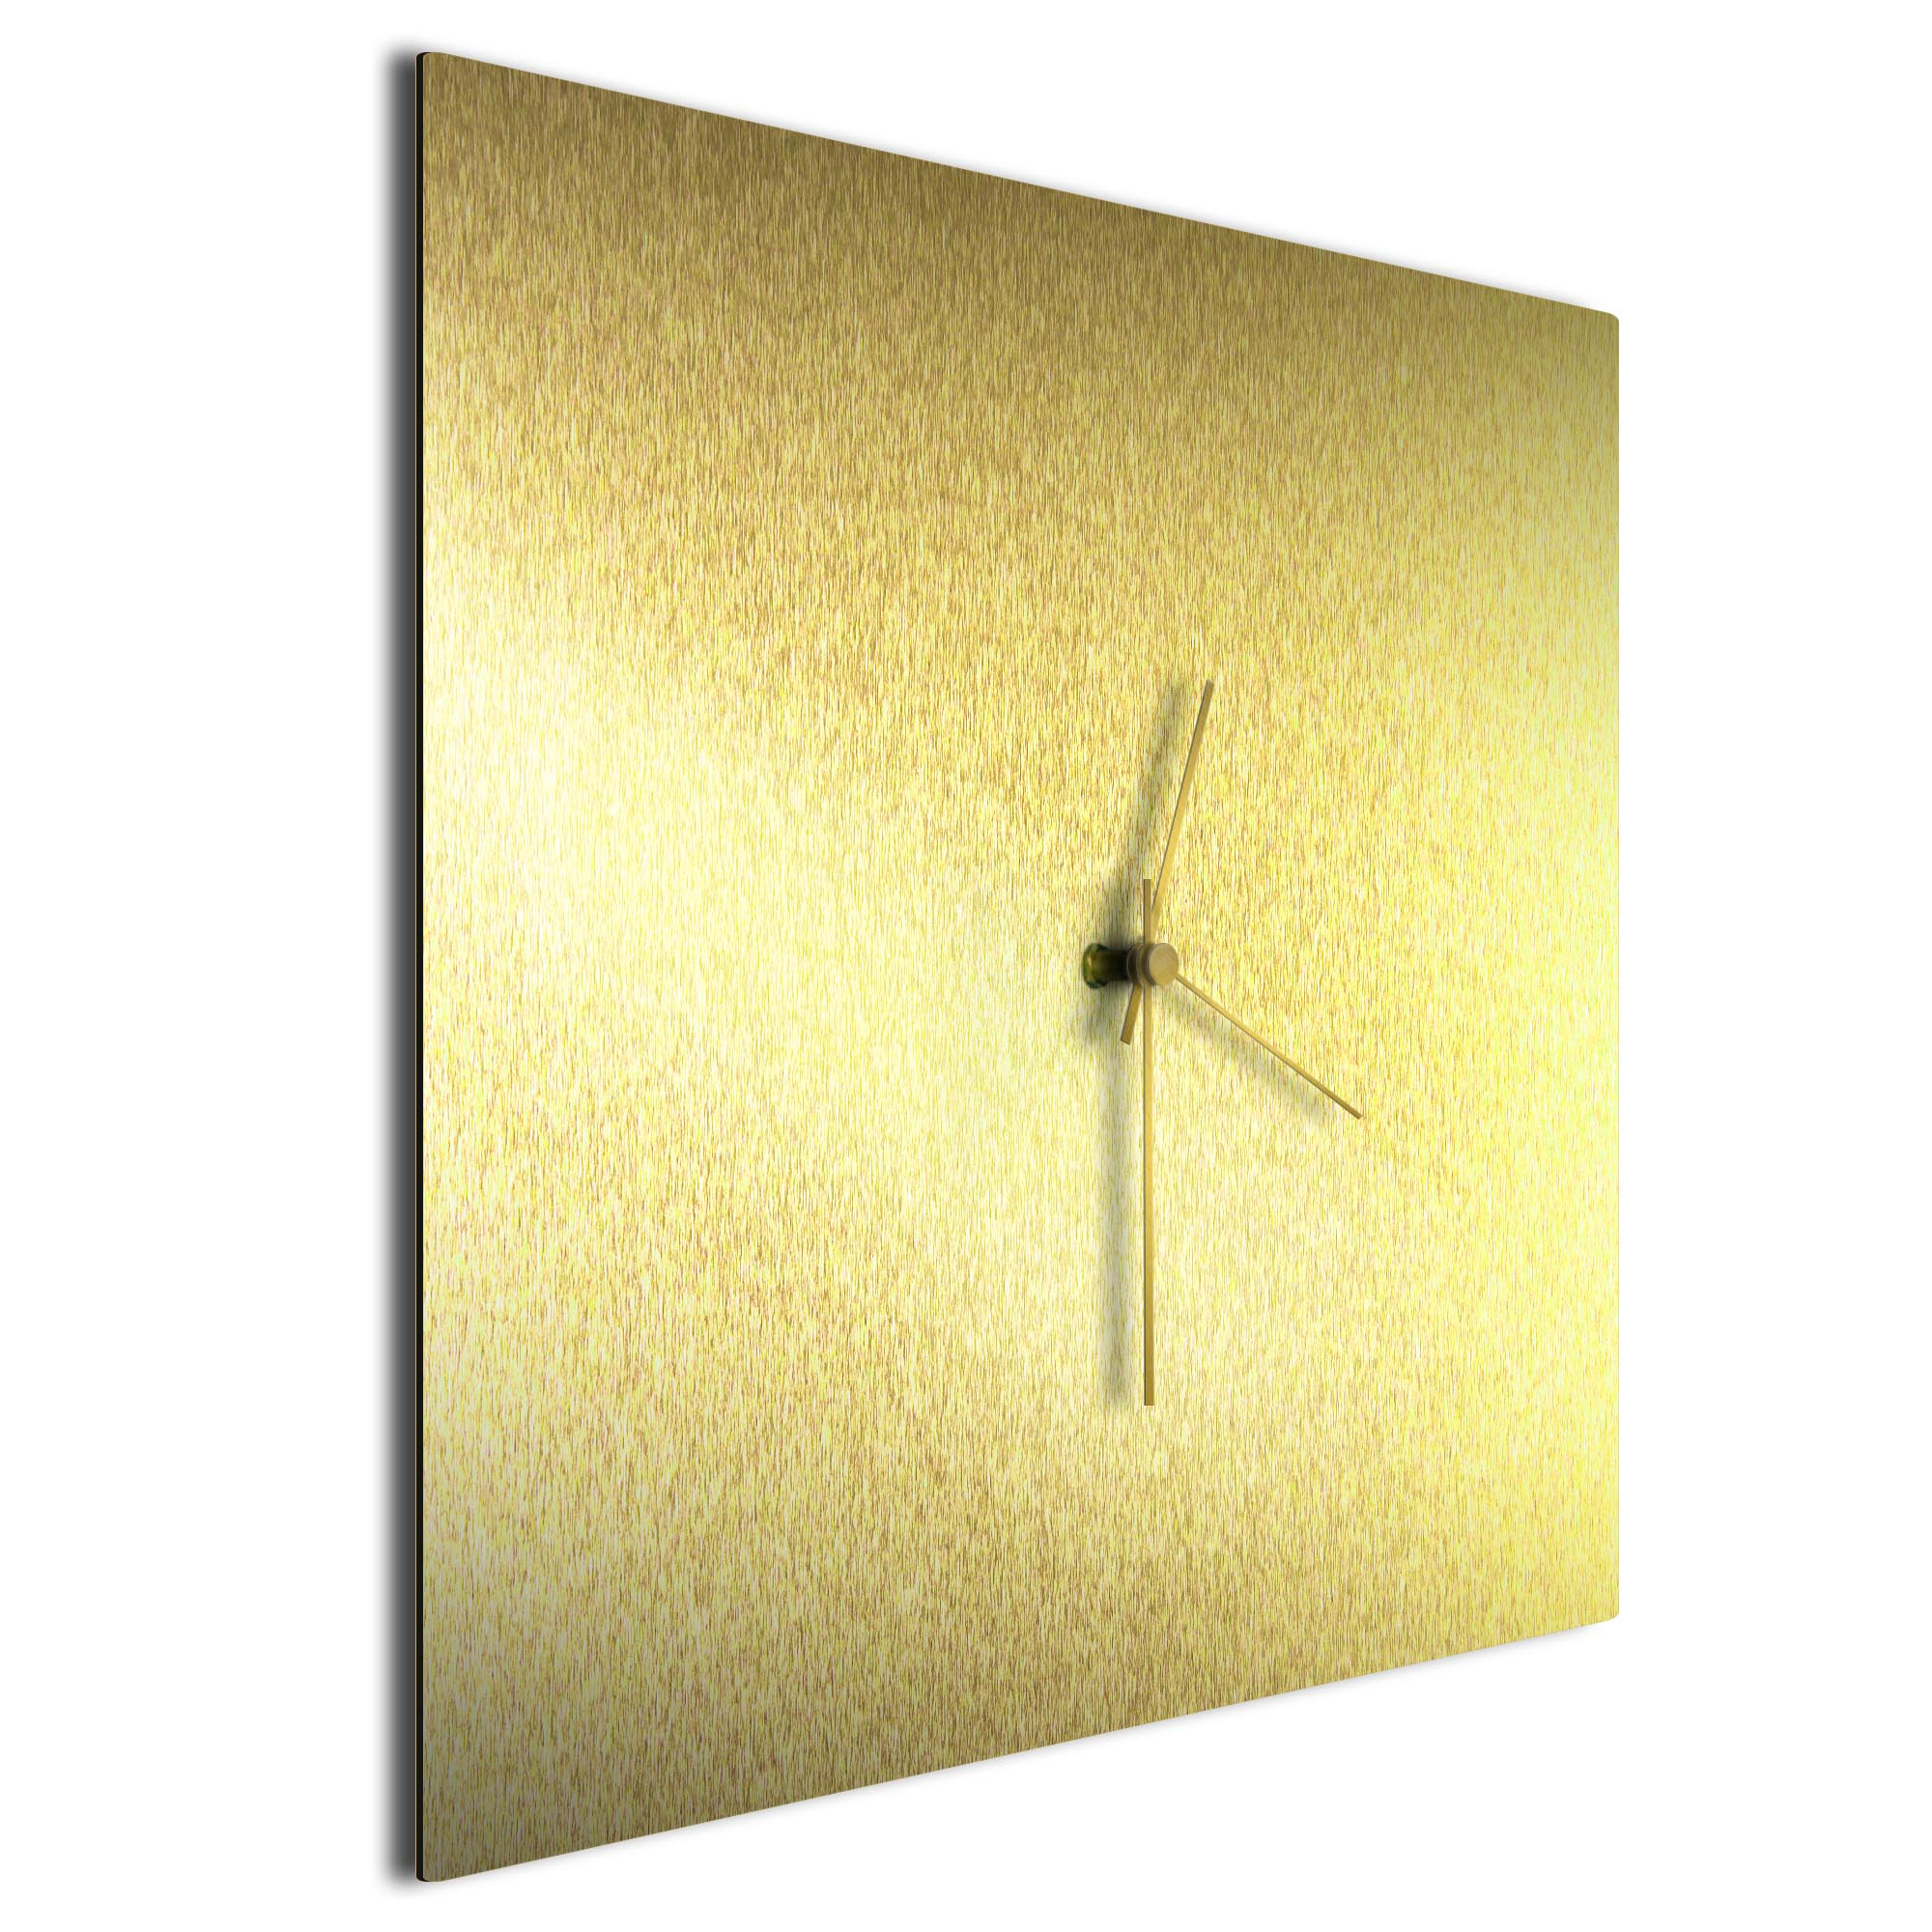 Goldsmith Square Clock Large Gold - Image 2